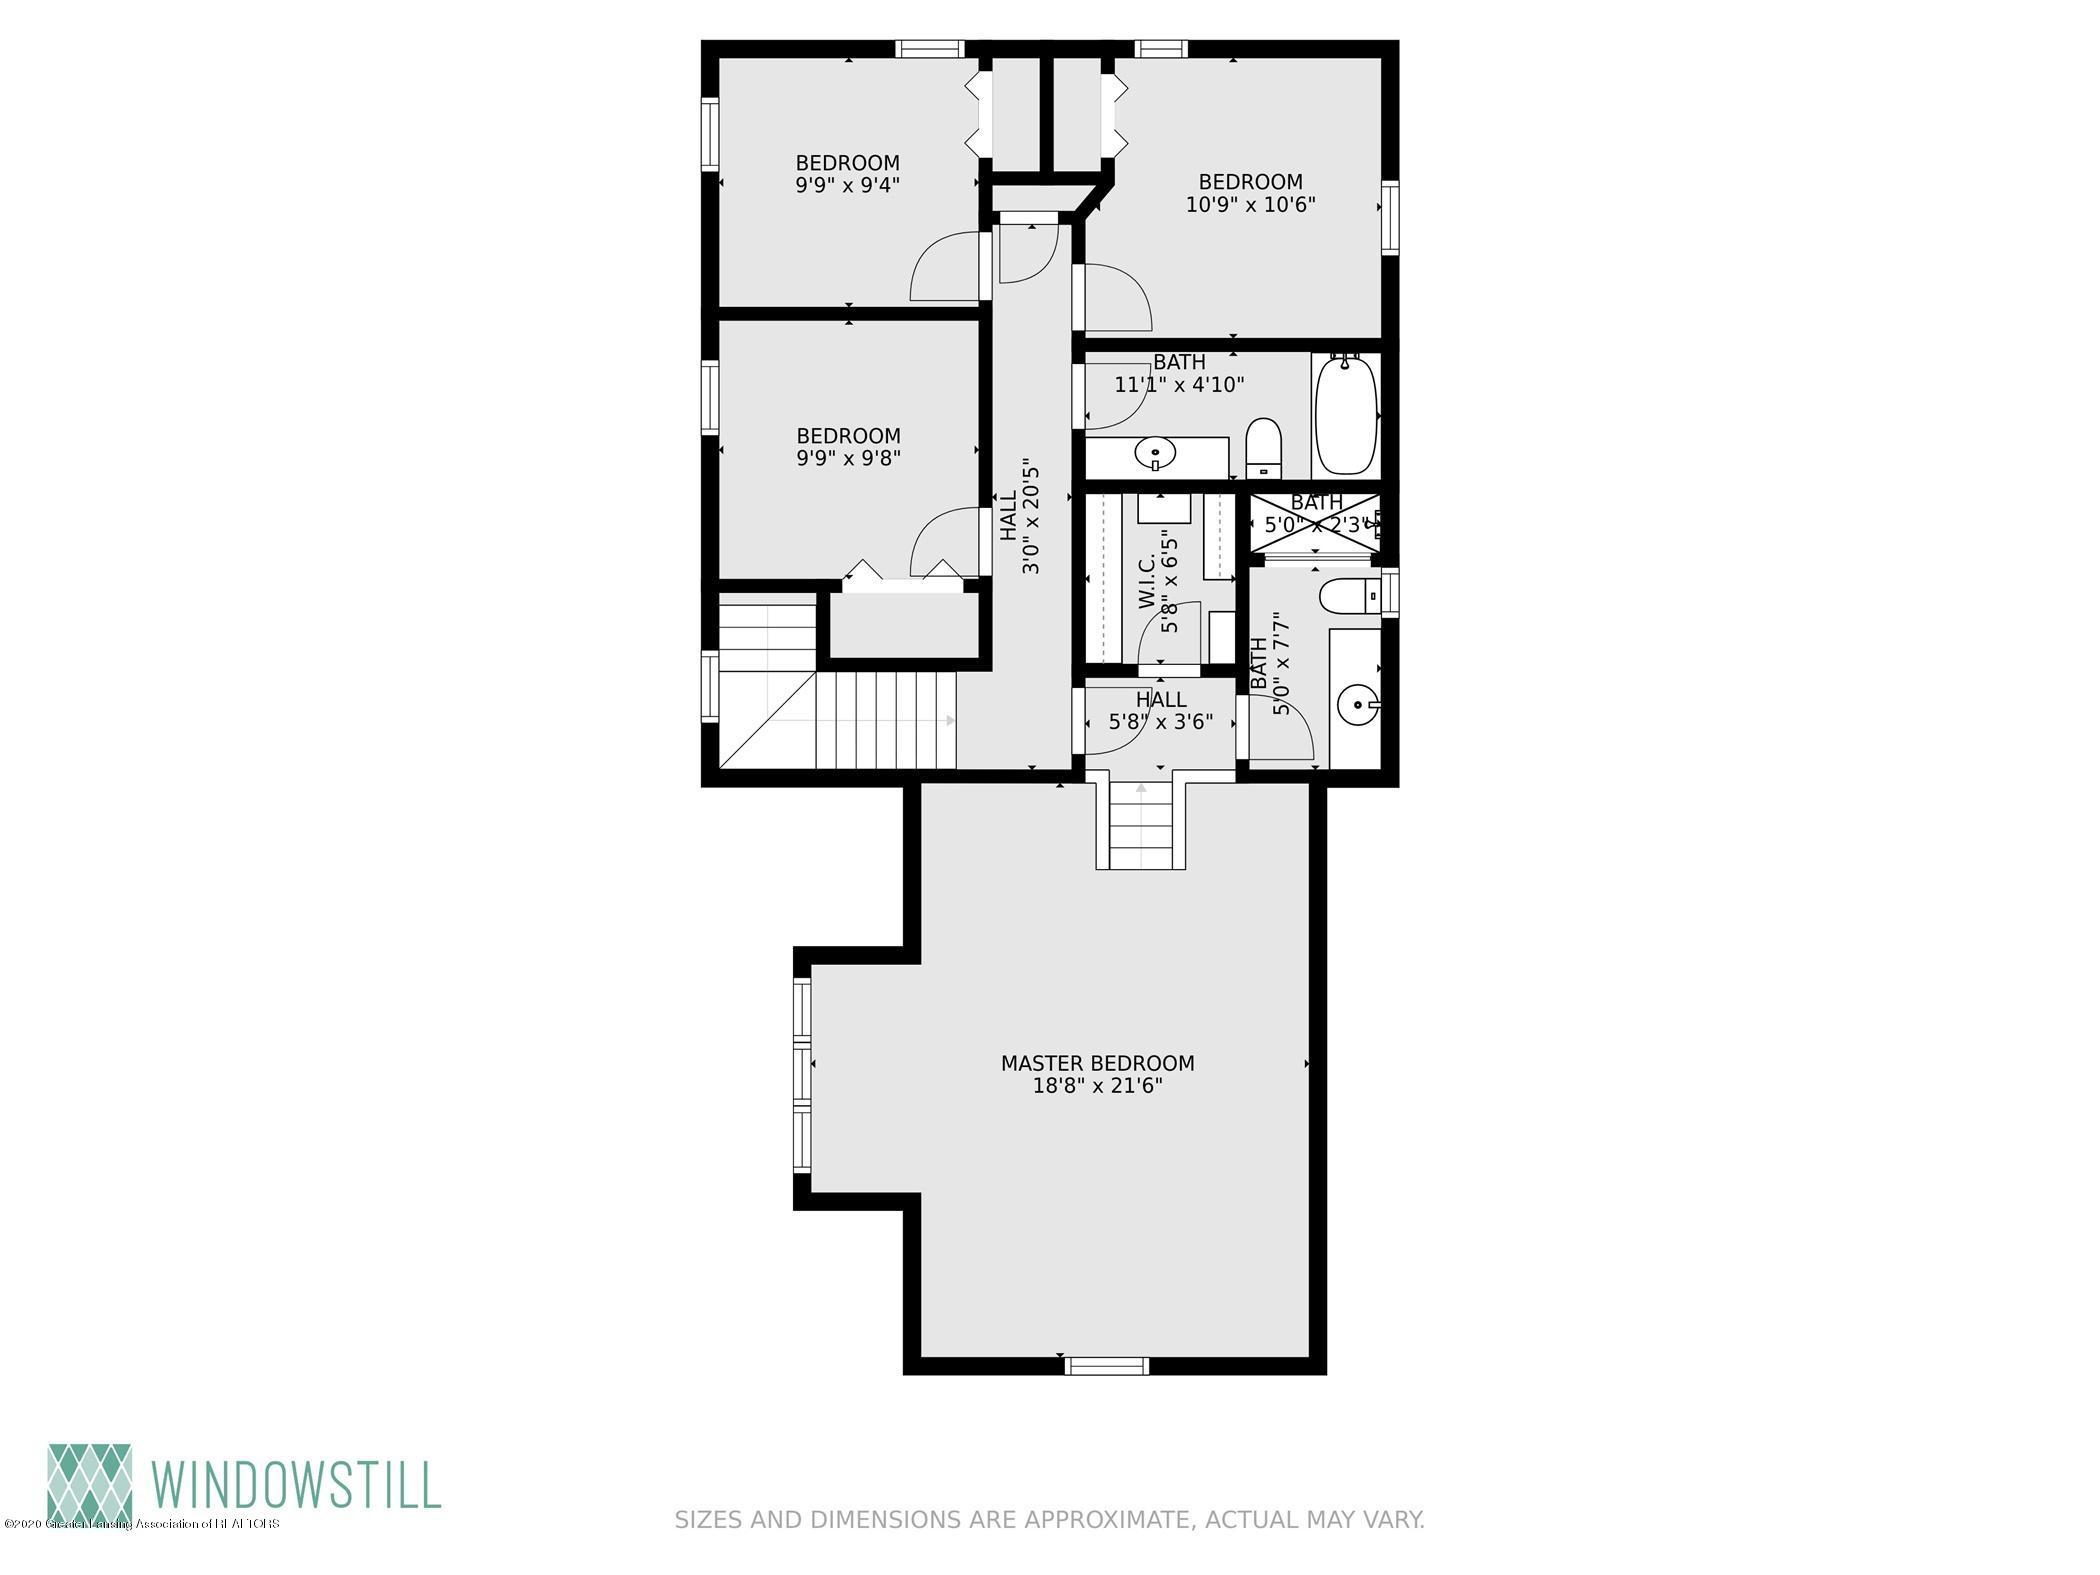 532 Anhinga Dr - 01-single-floor-dim_2 - 37